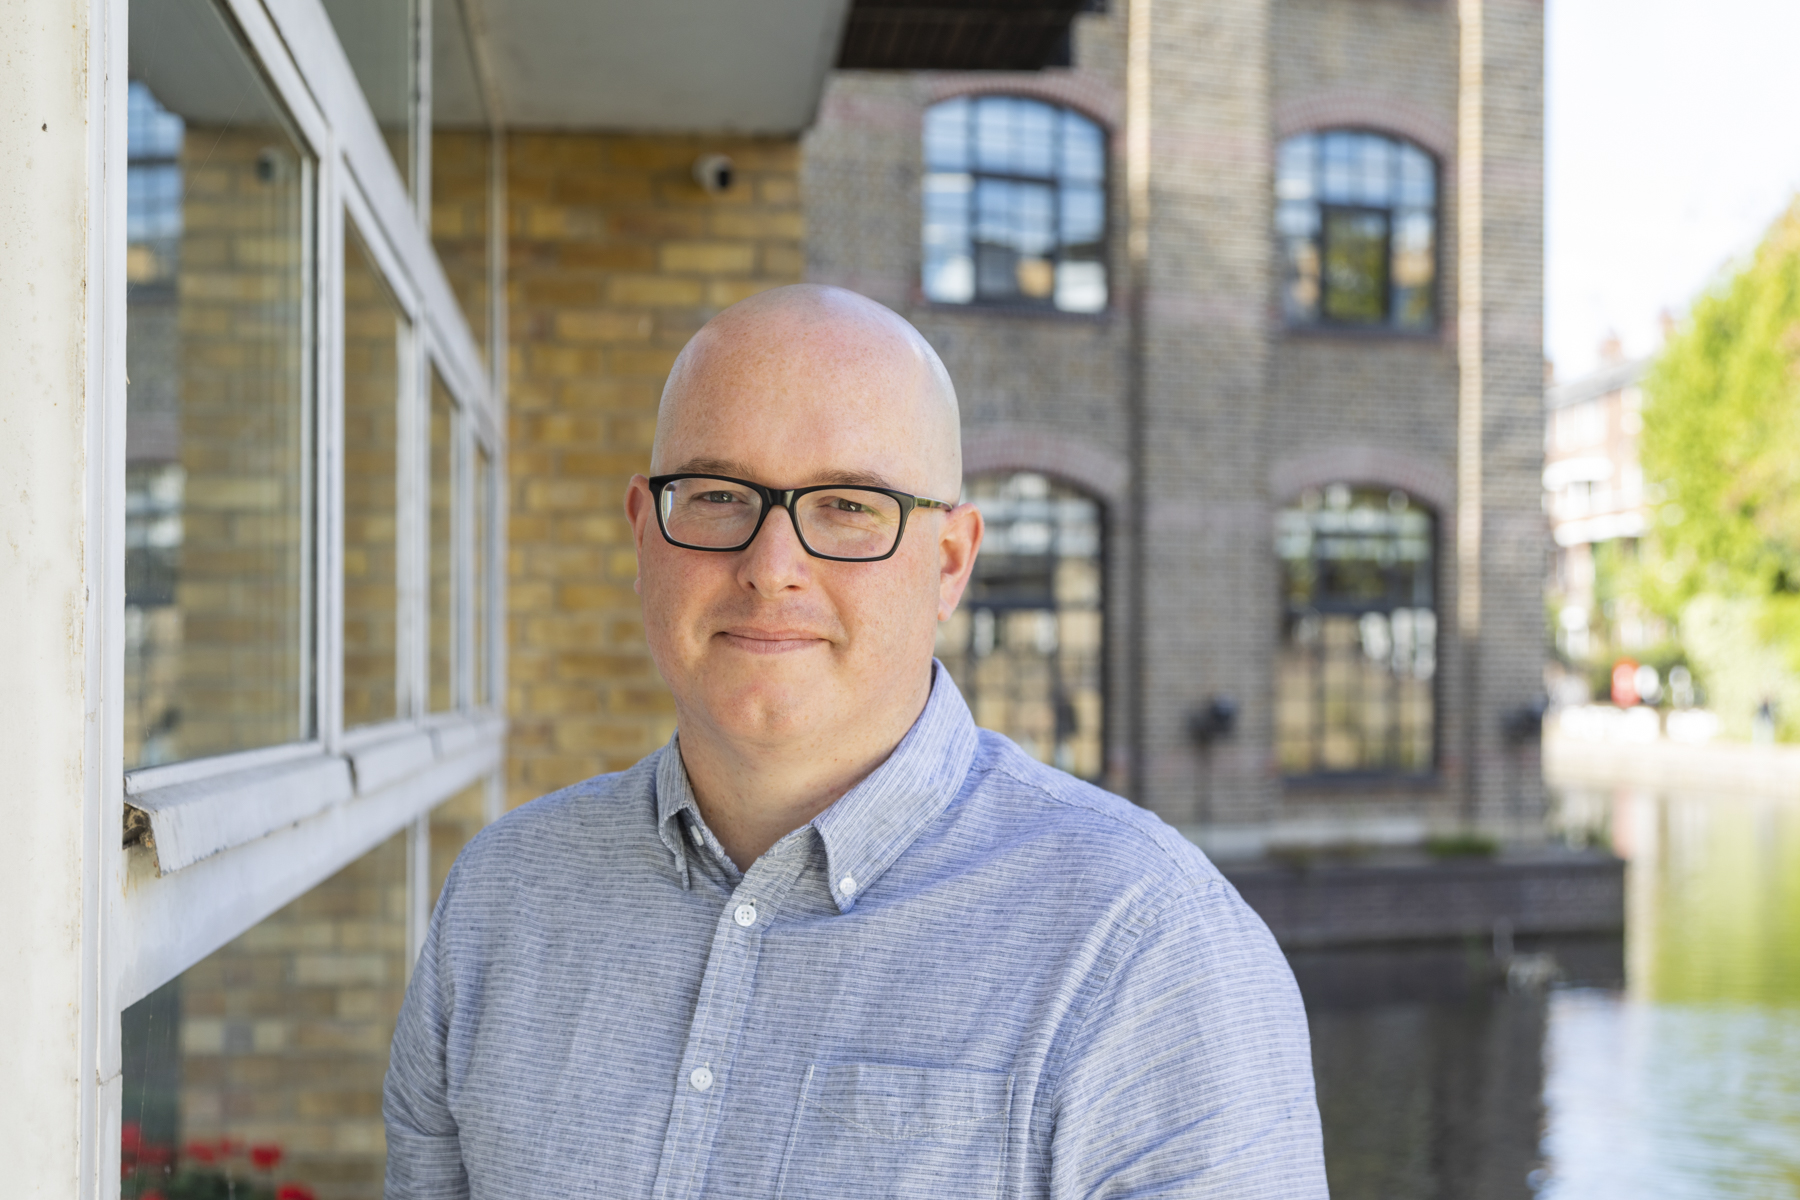 A photo of Alex Stevenson from September 2019